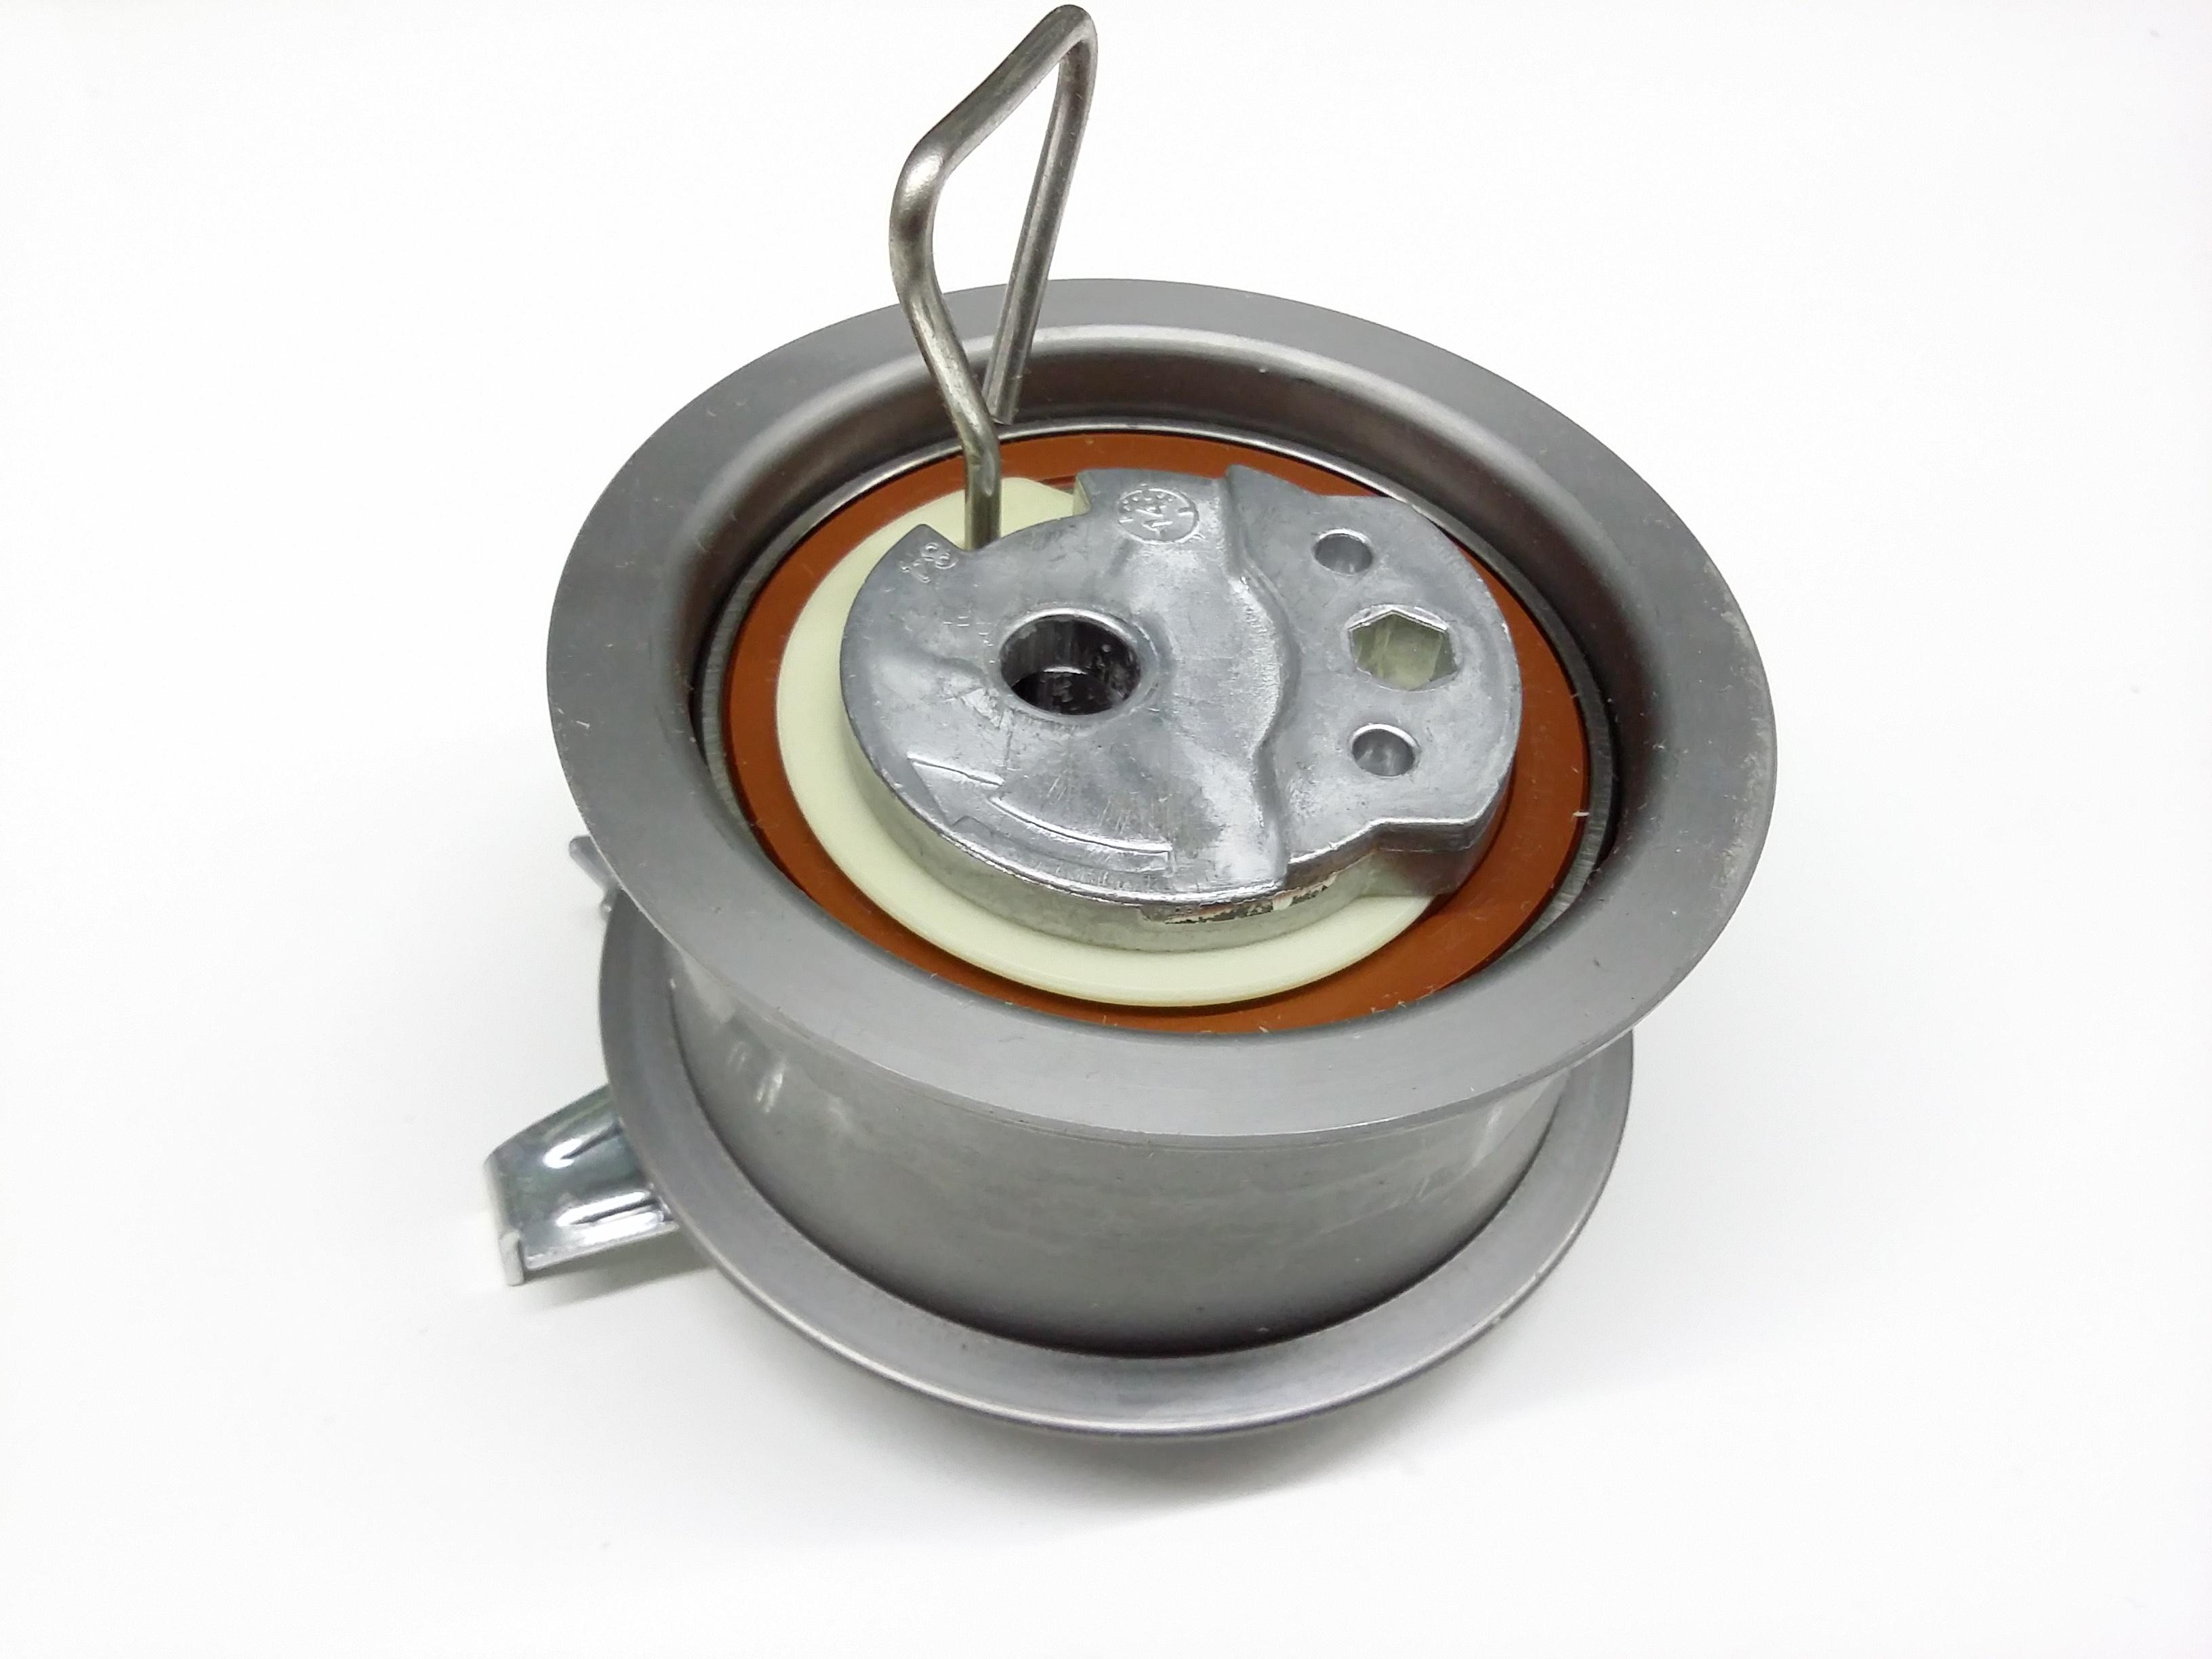 Pulley Tensioner Bar : Volkswagen jetta engine timing belt tensioner